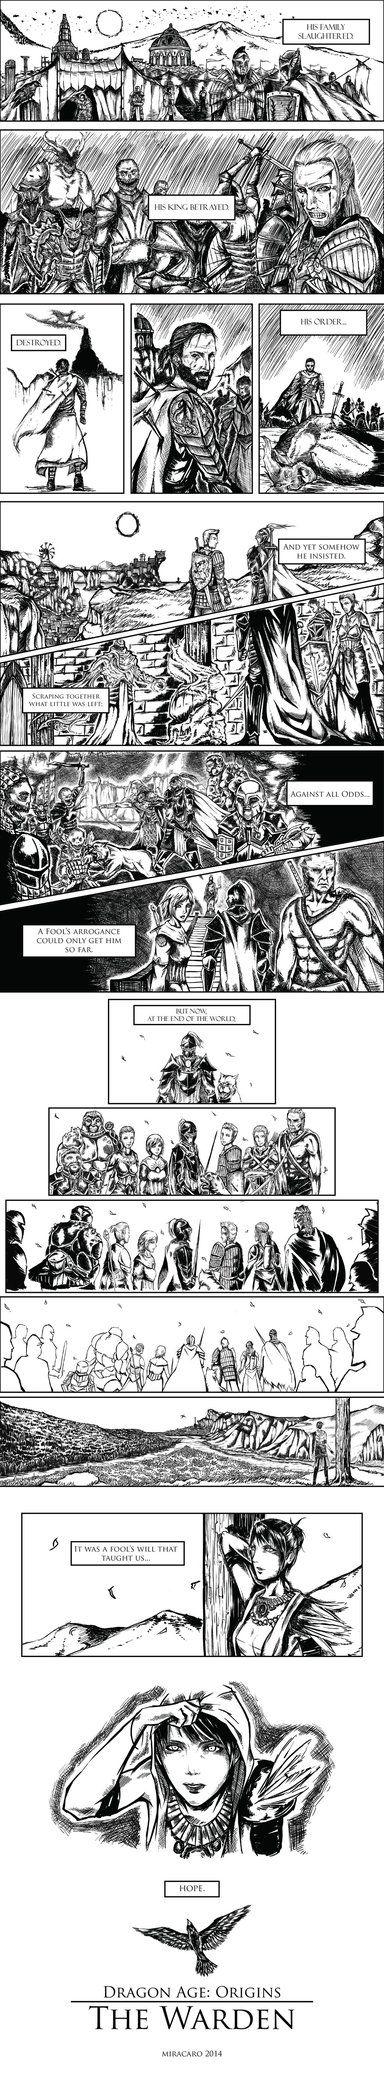 Dragon Age Origins: The Warden by miracaro